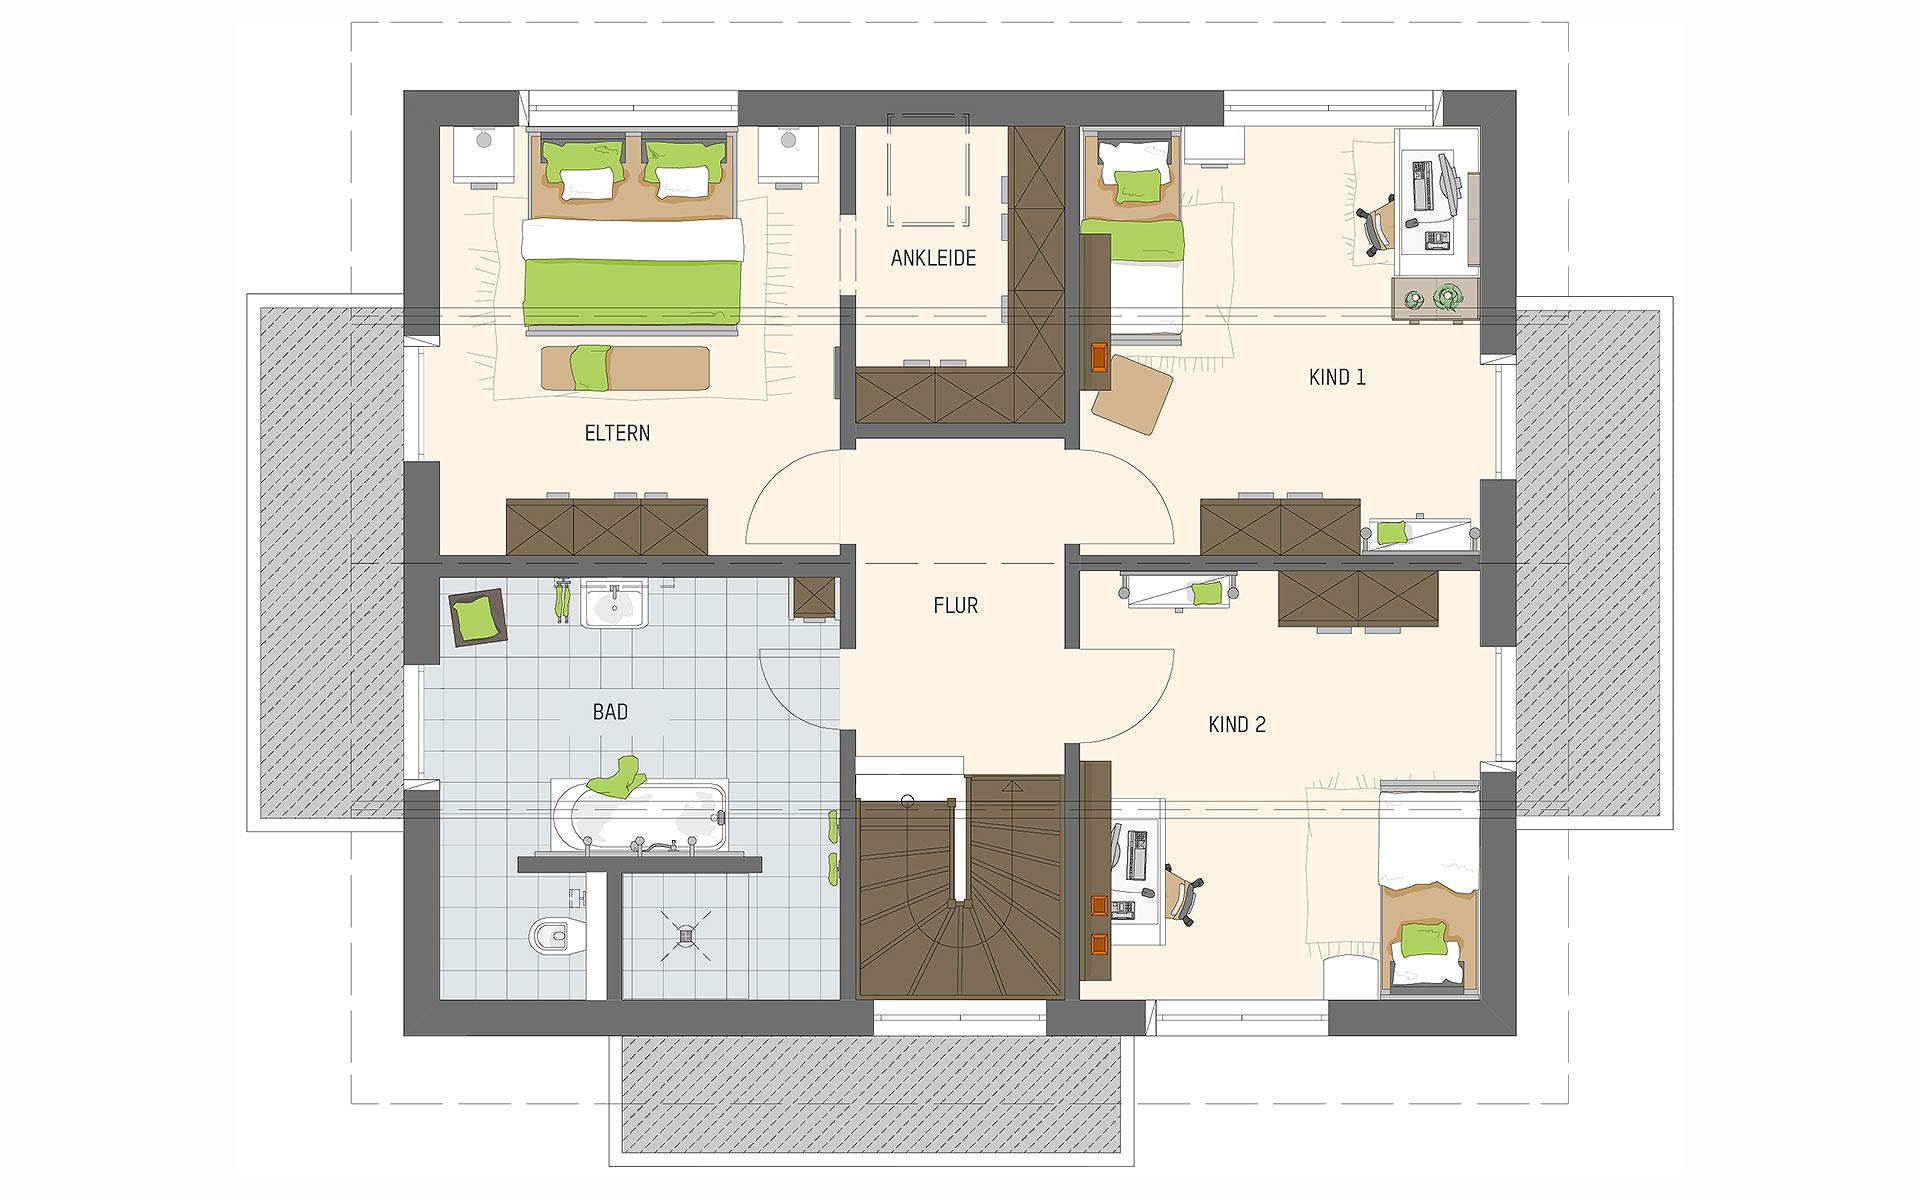 Dachgeschoss MELDEY 3.0 - MH Poing von FingerHaus GmbH